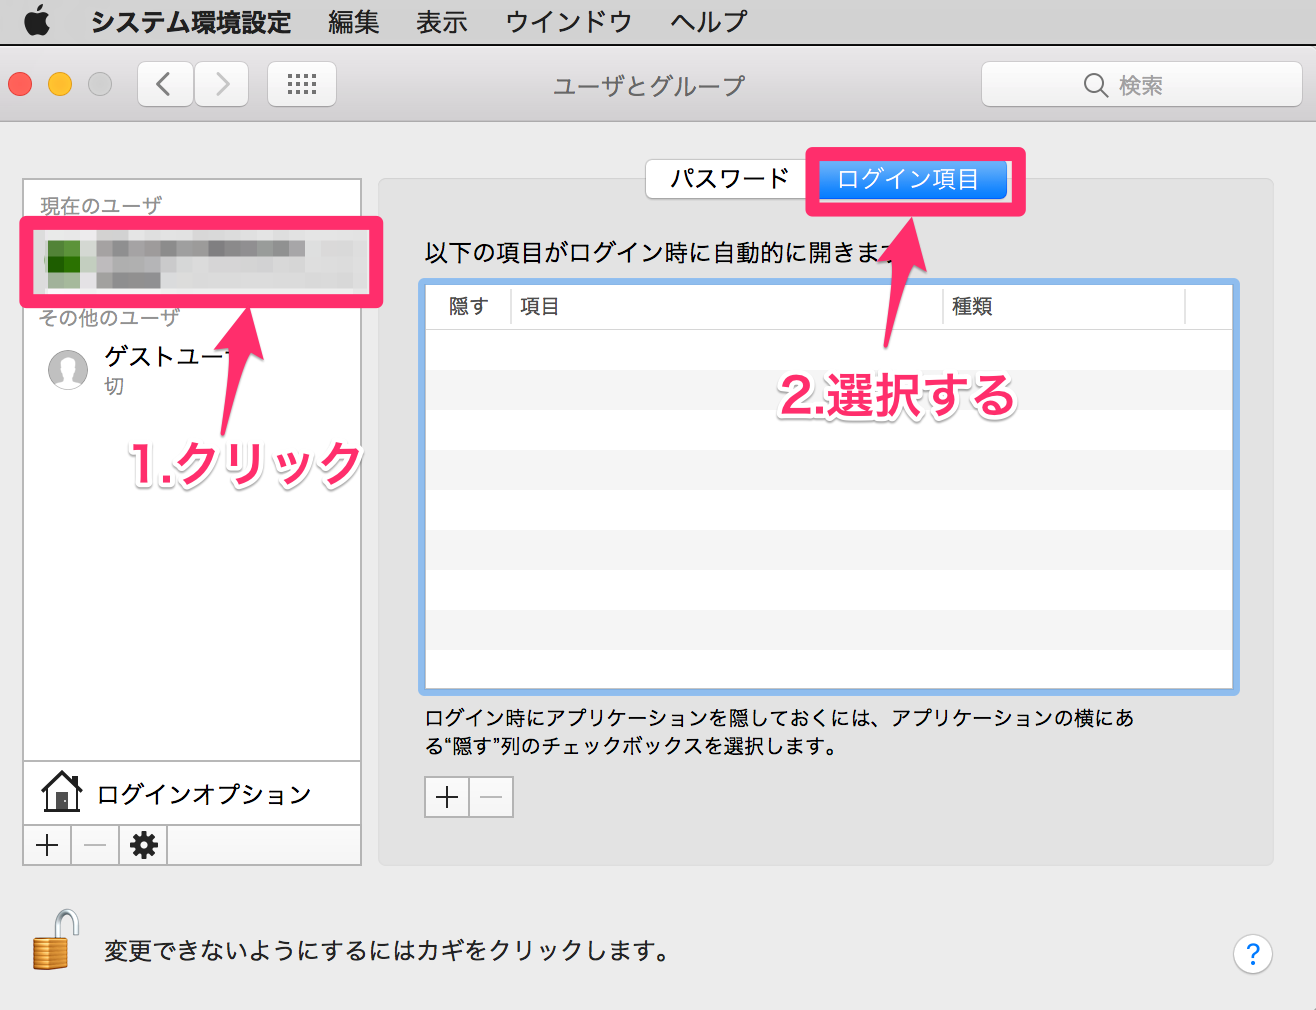 Menubar_と_ユーザとグループ_と_「Macの自動起動周り」を編集_-_Qiita.png